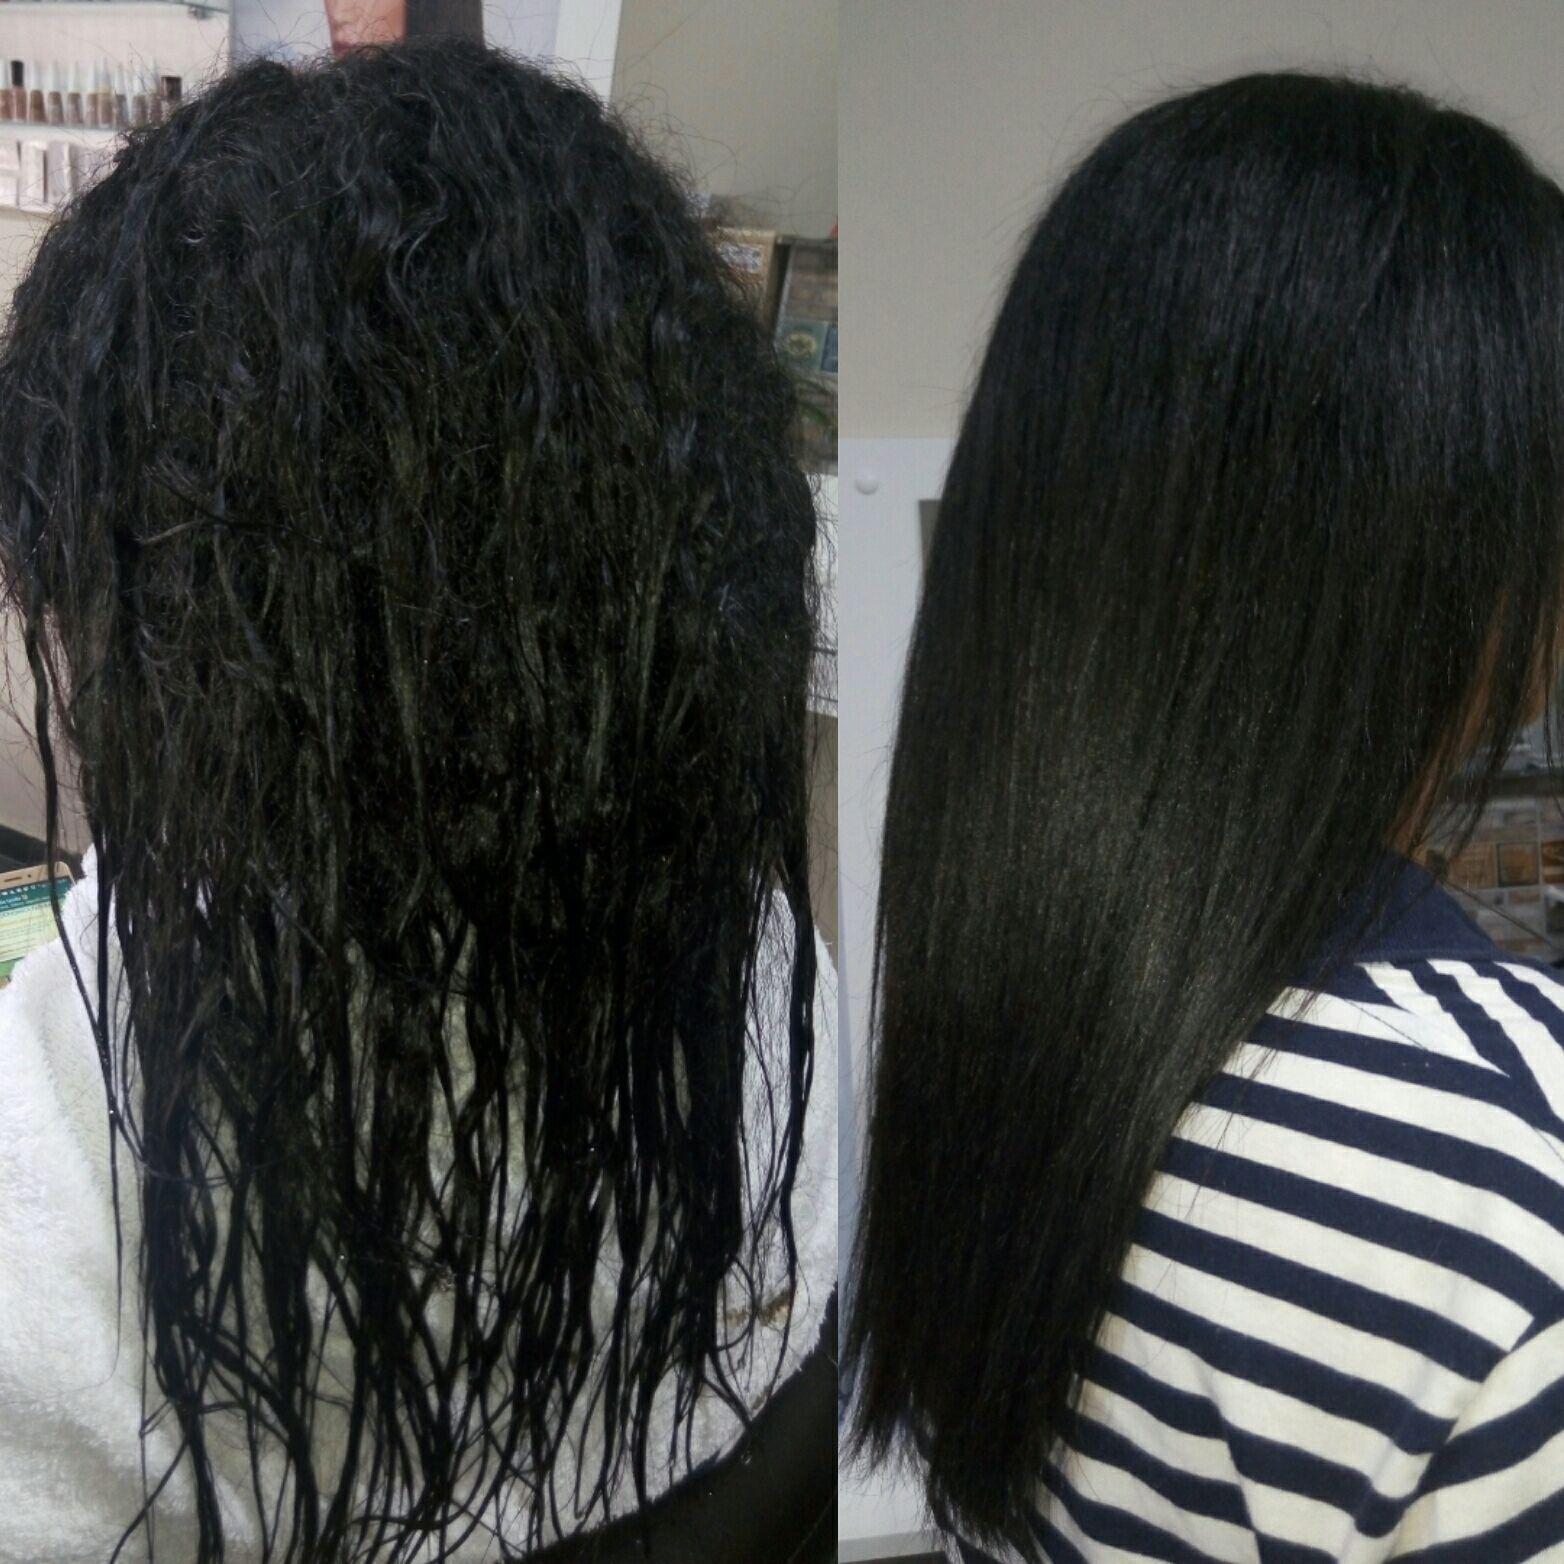 Escova Progressiva Maria Glamourosa cabelo auxiliar cabeleireiro(a) cabeleireiro(a) auxiliar cabeleireiro(a)